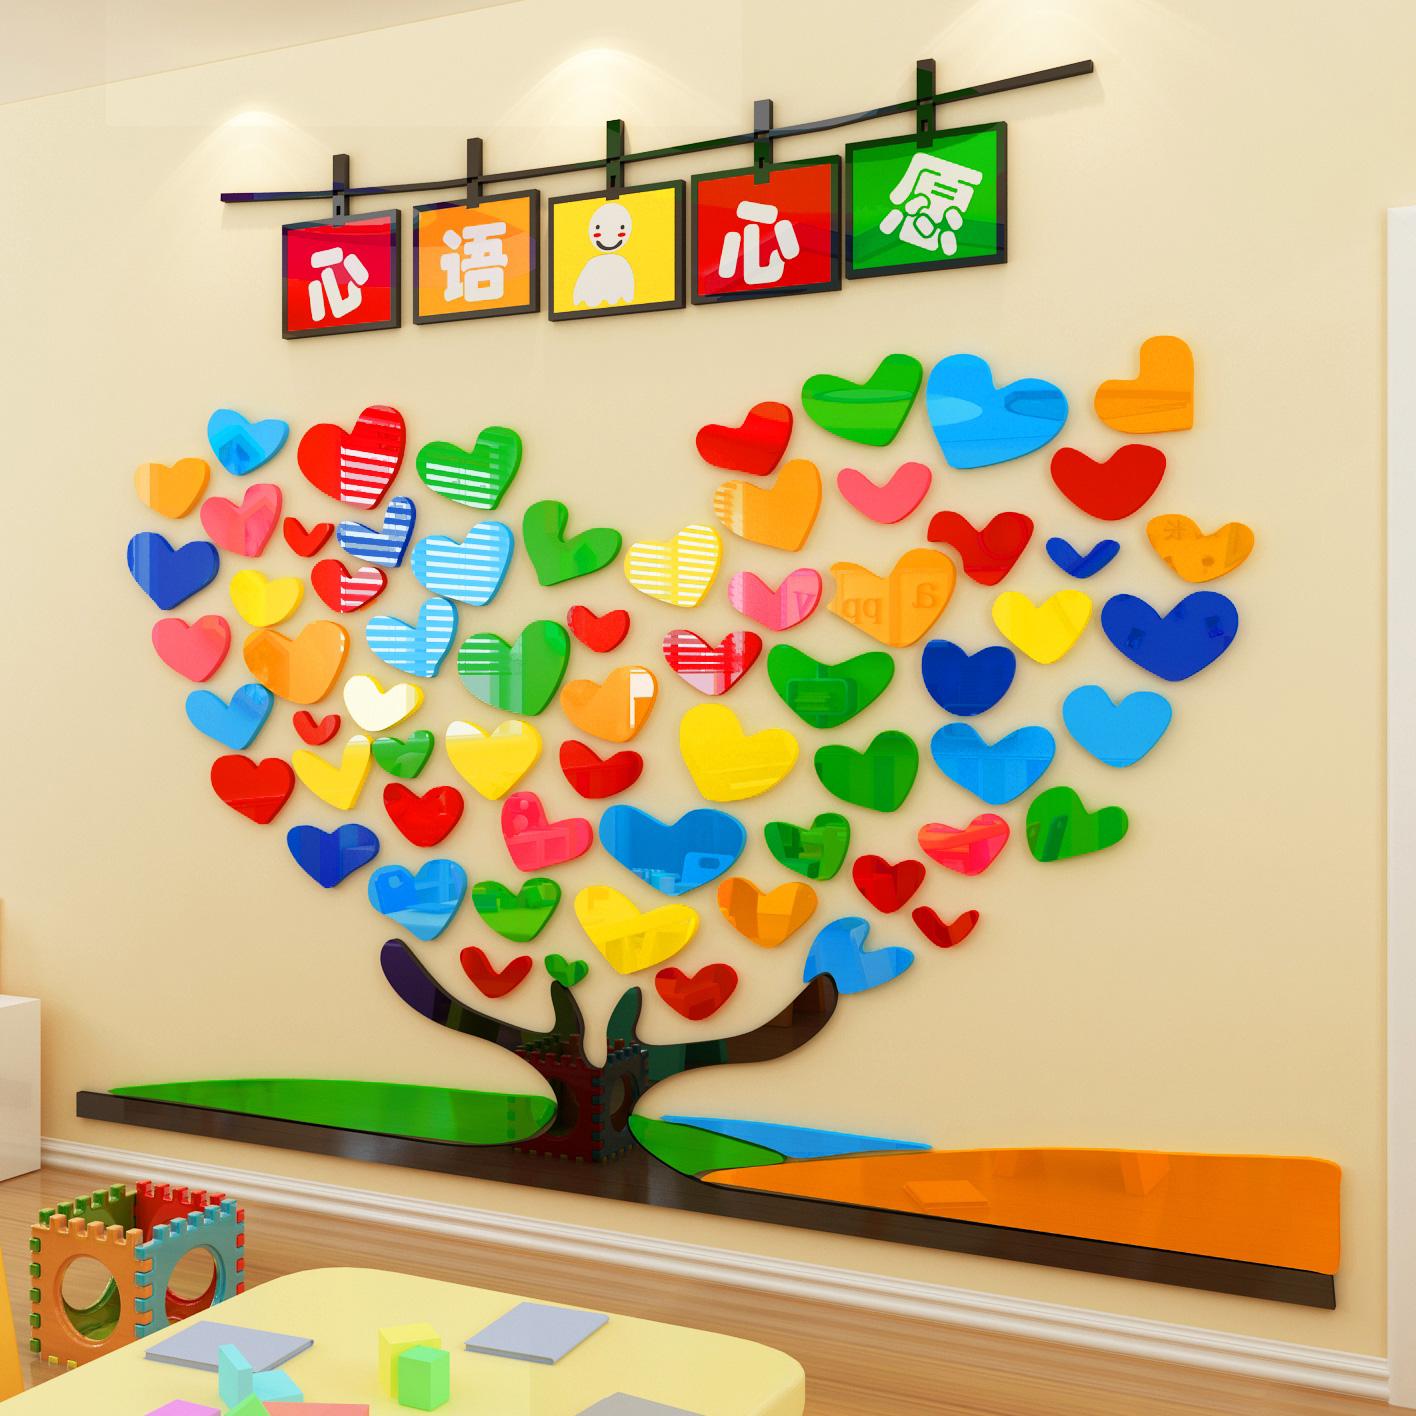 Creative Wishing Wall Love Tree Sticker Class Culture Wall Sticker ...